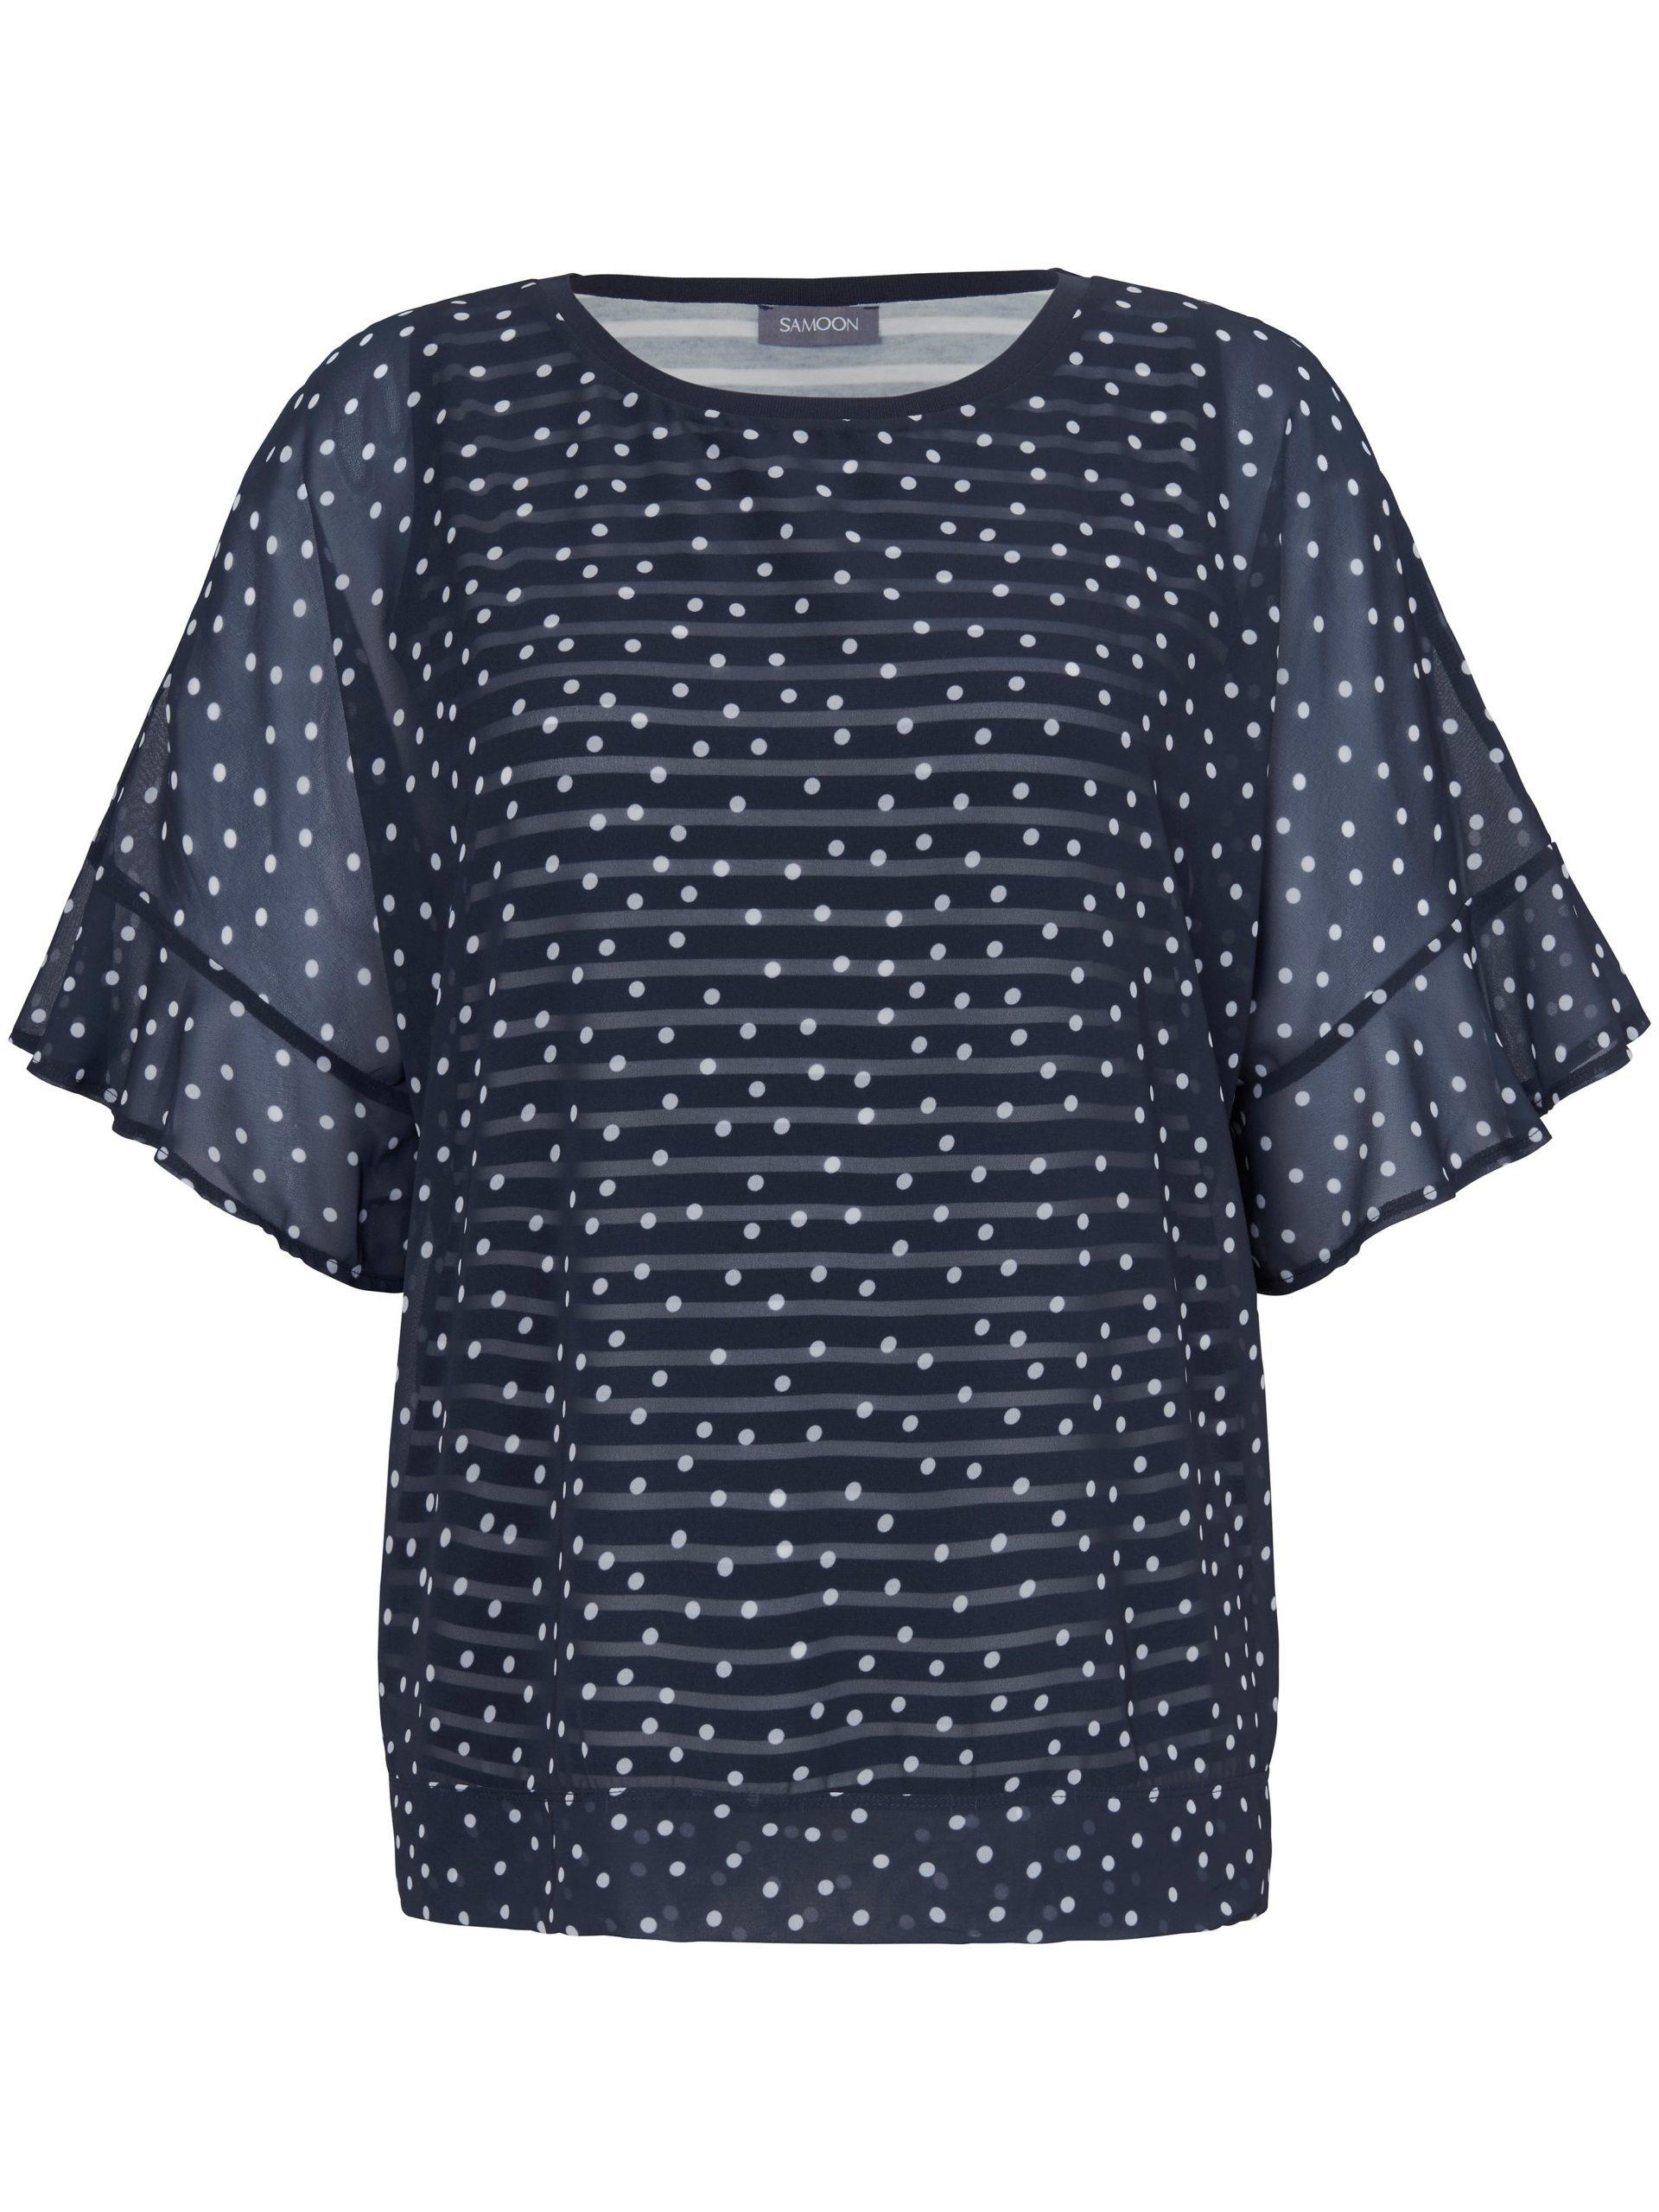 2-in-1-blouse met stippenprint Van Samoon multicolour Kopen